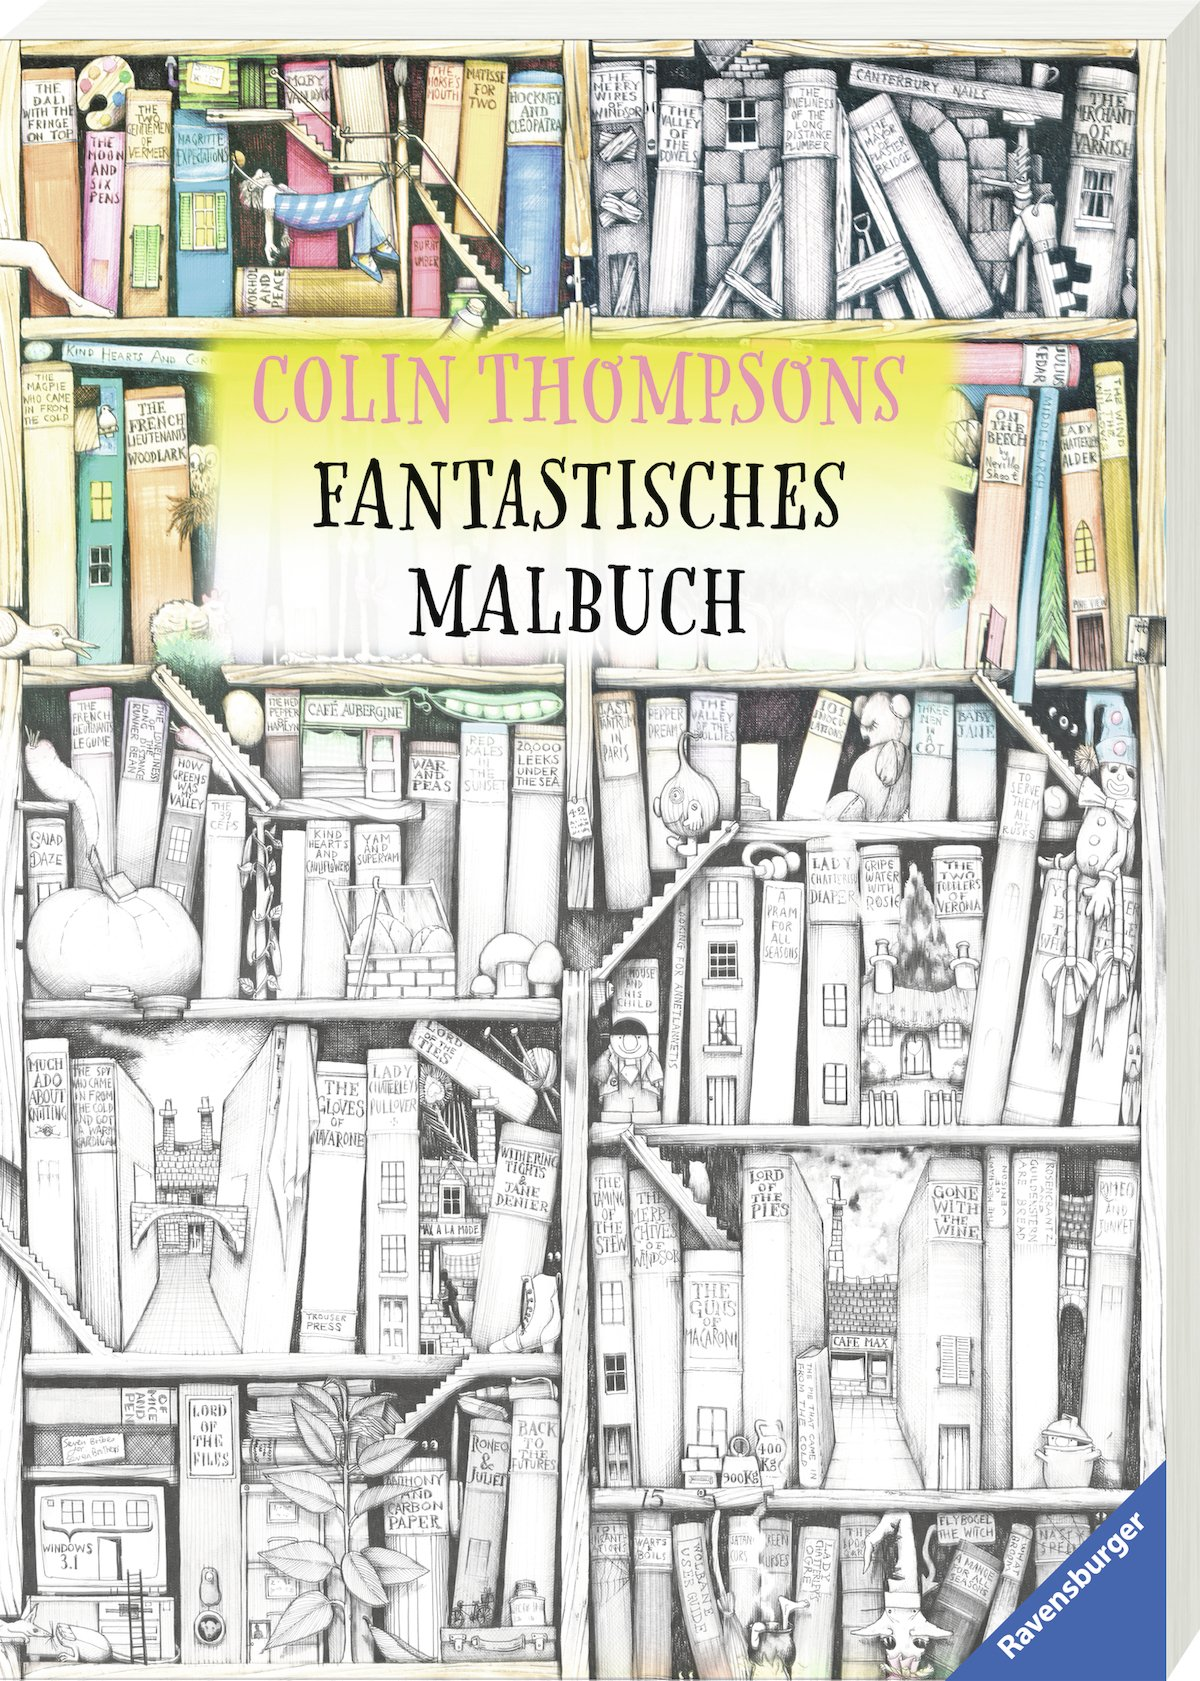 Colin Thompsons Fantastisches Malbuch: Amazon.de: Colin Thompson: Bücher